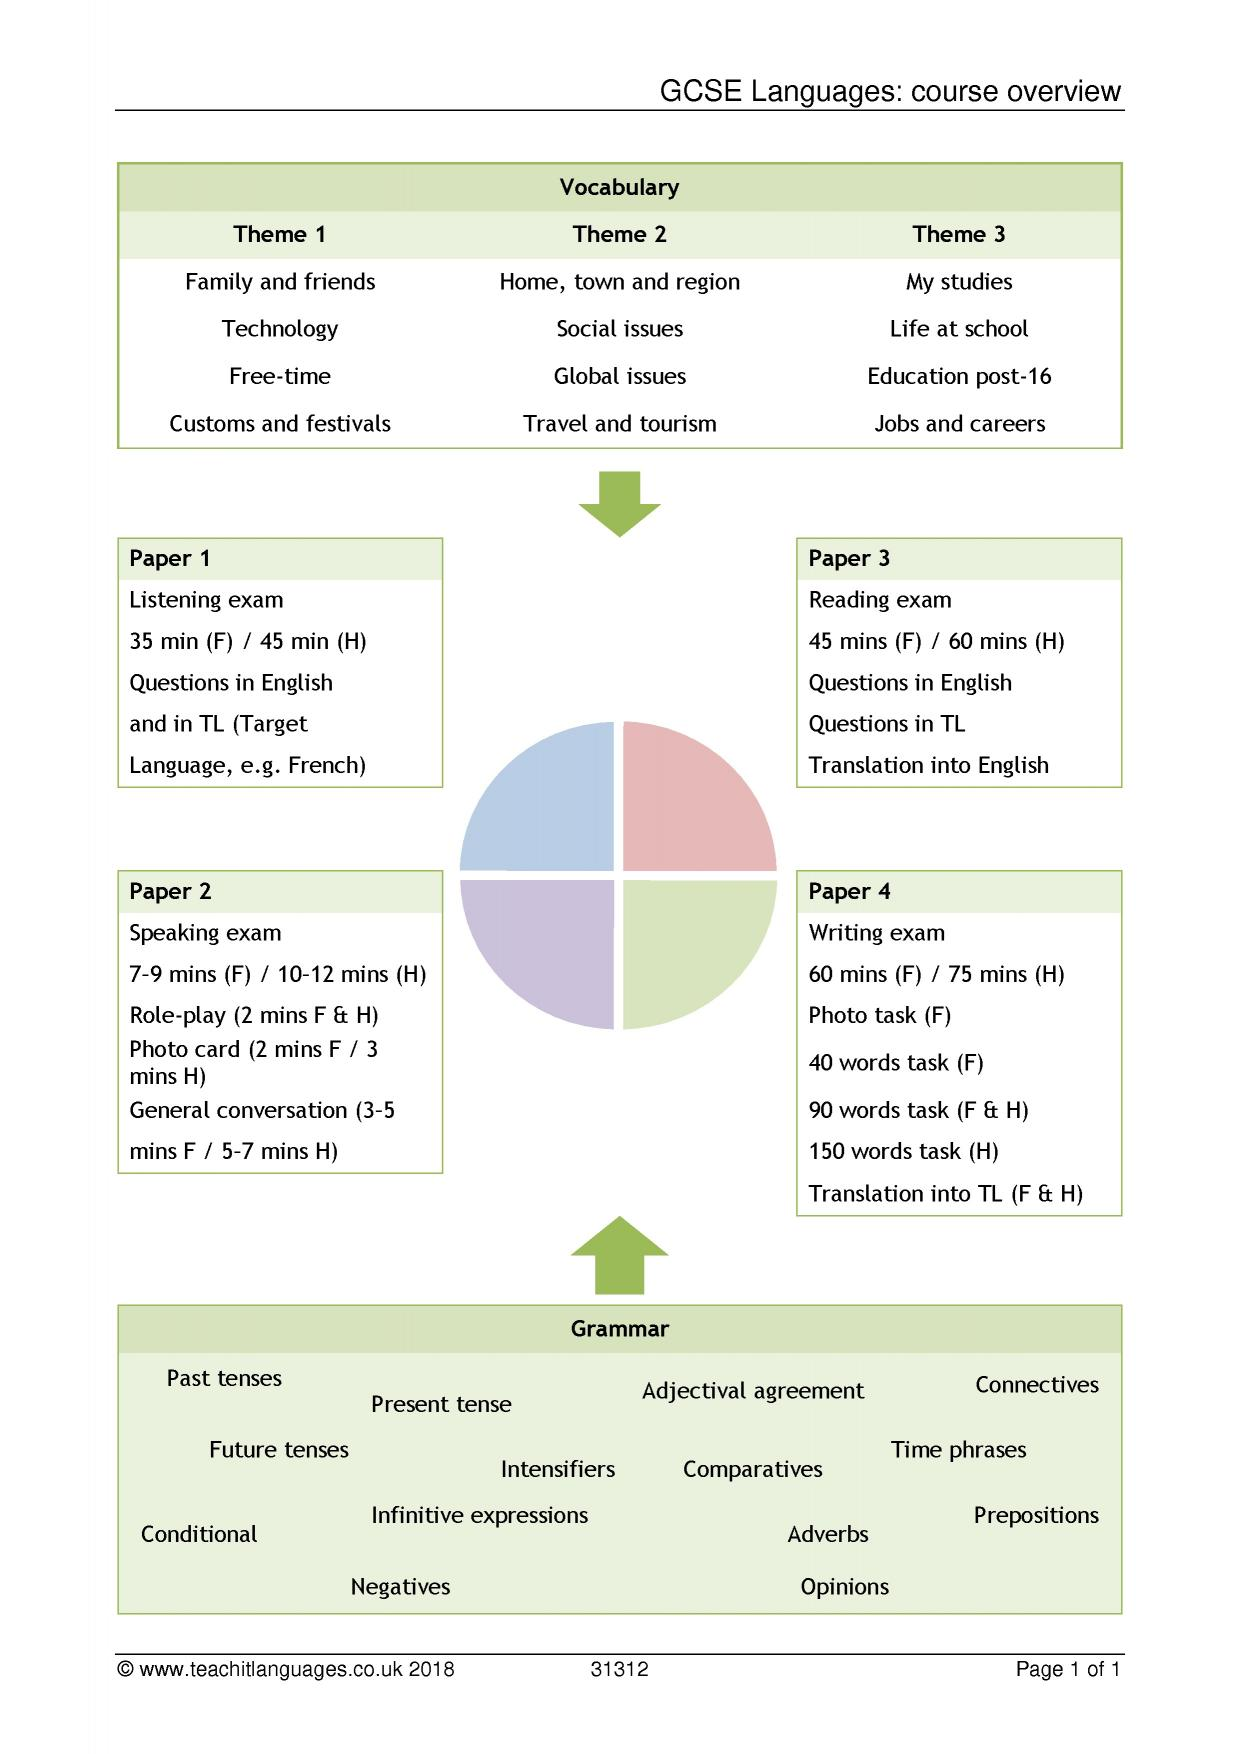 Spanish language teaching resources - Teachit Languages